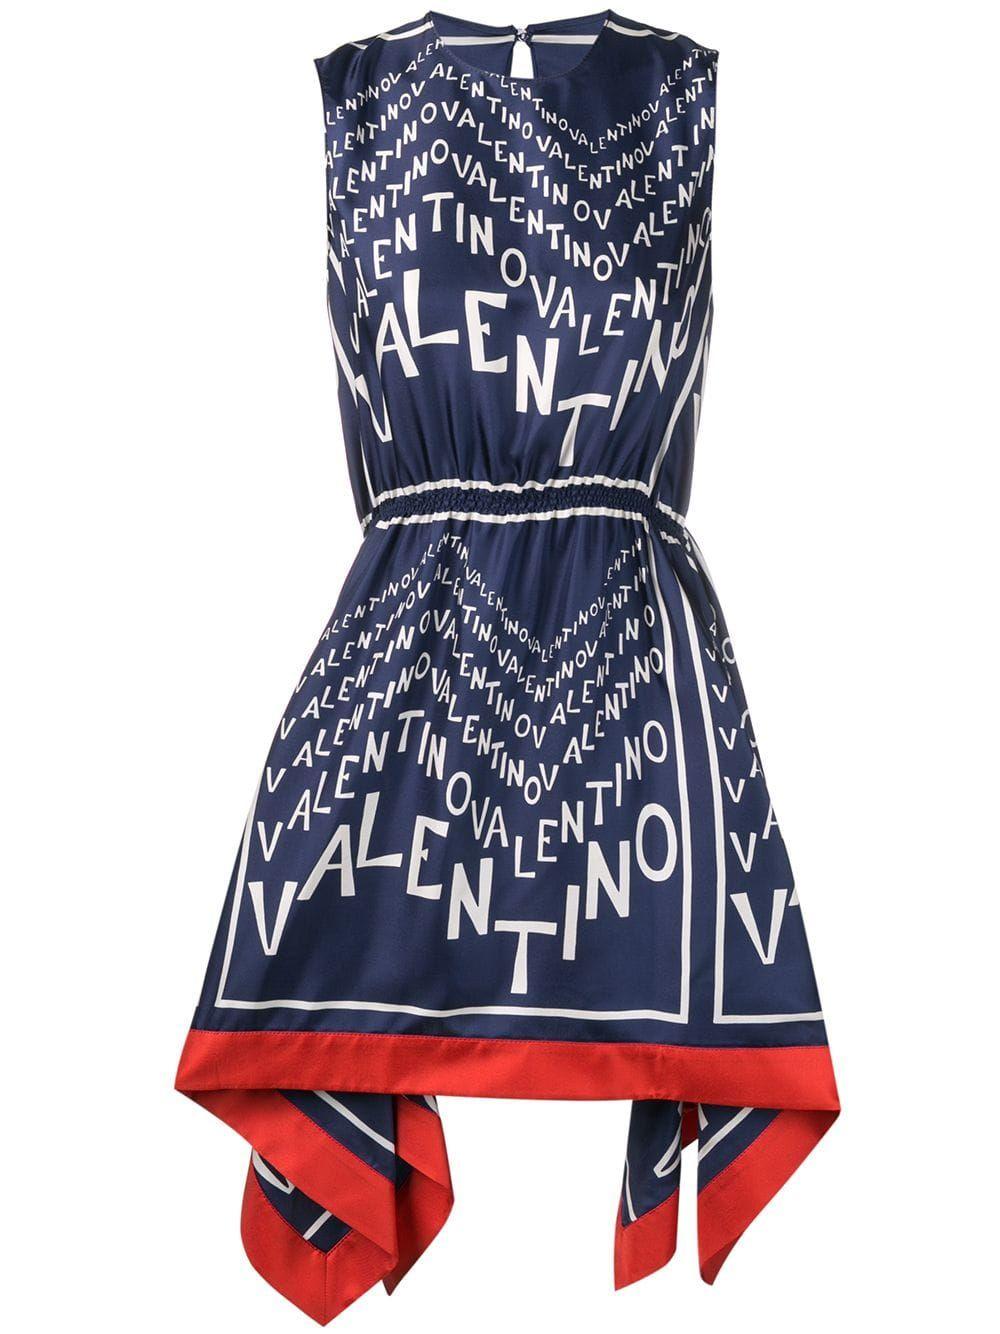 541fda74f0 Valentino logo-print dress - Blue in 2019 | Products | Dresses ...